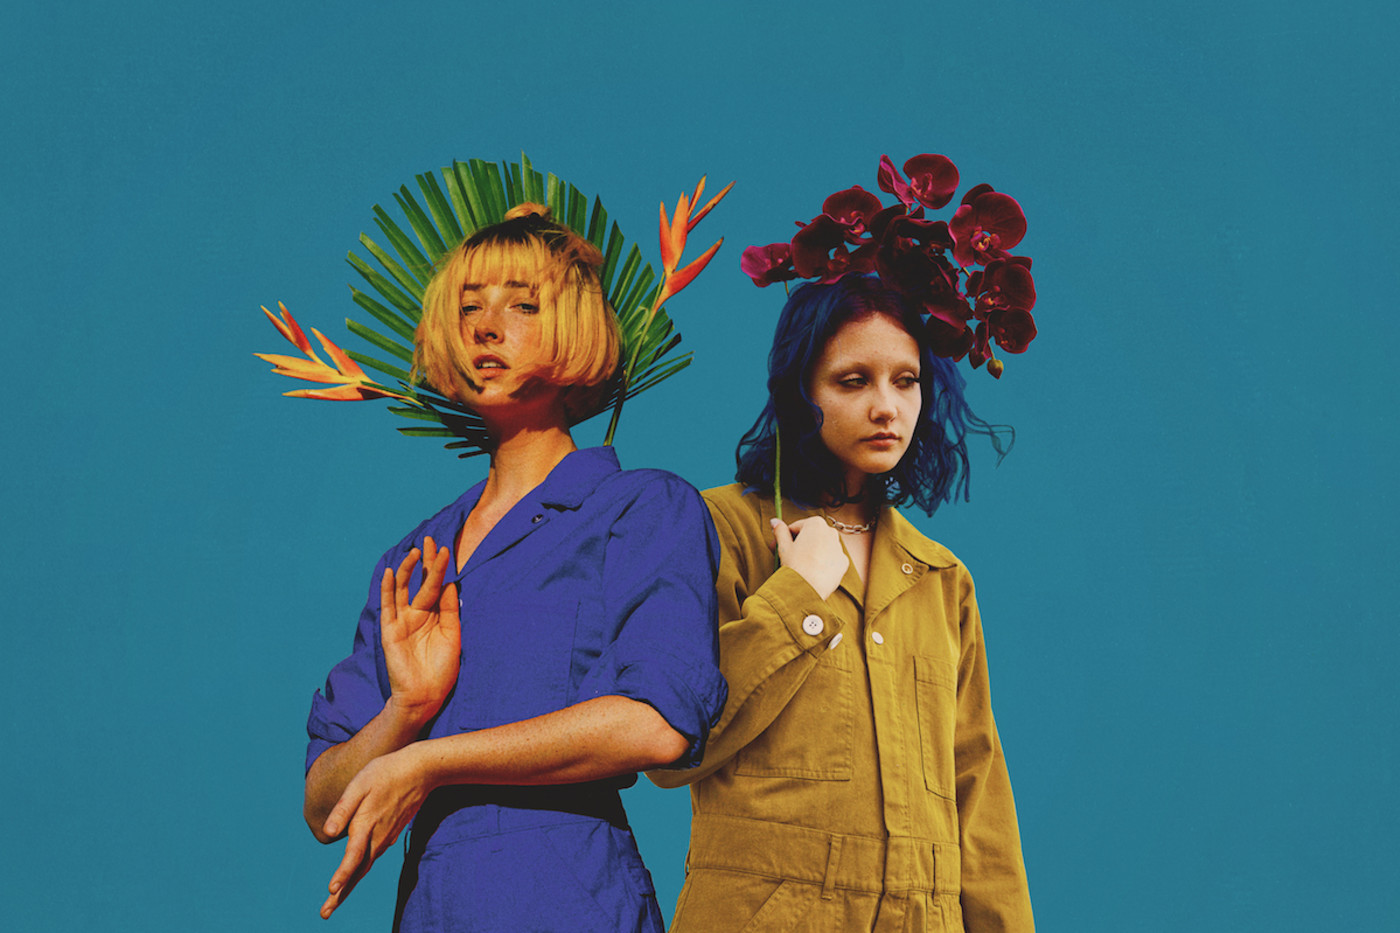 Tessa Violet & Chloe Moriondo (credit: Brian Gahan & Rose Hohl)